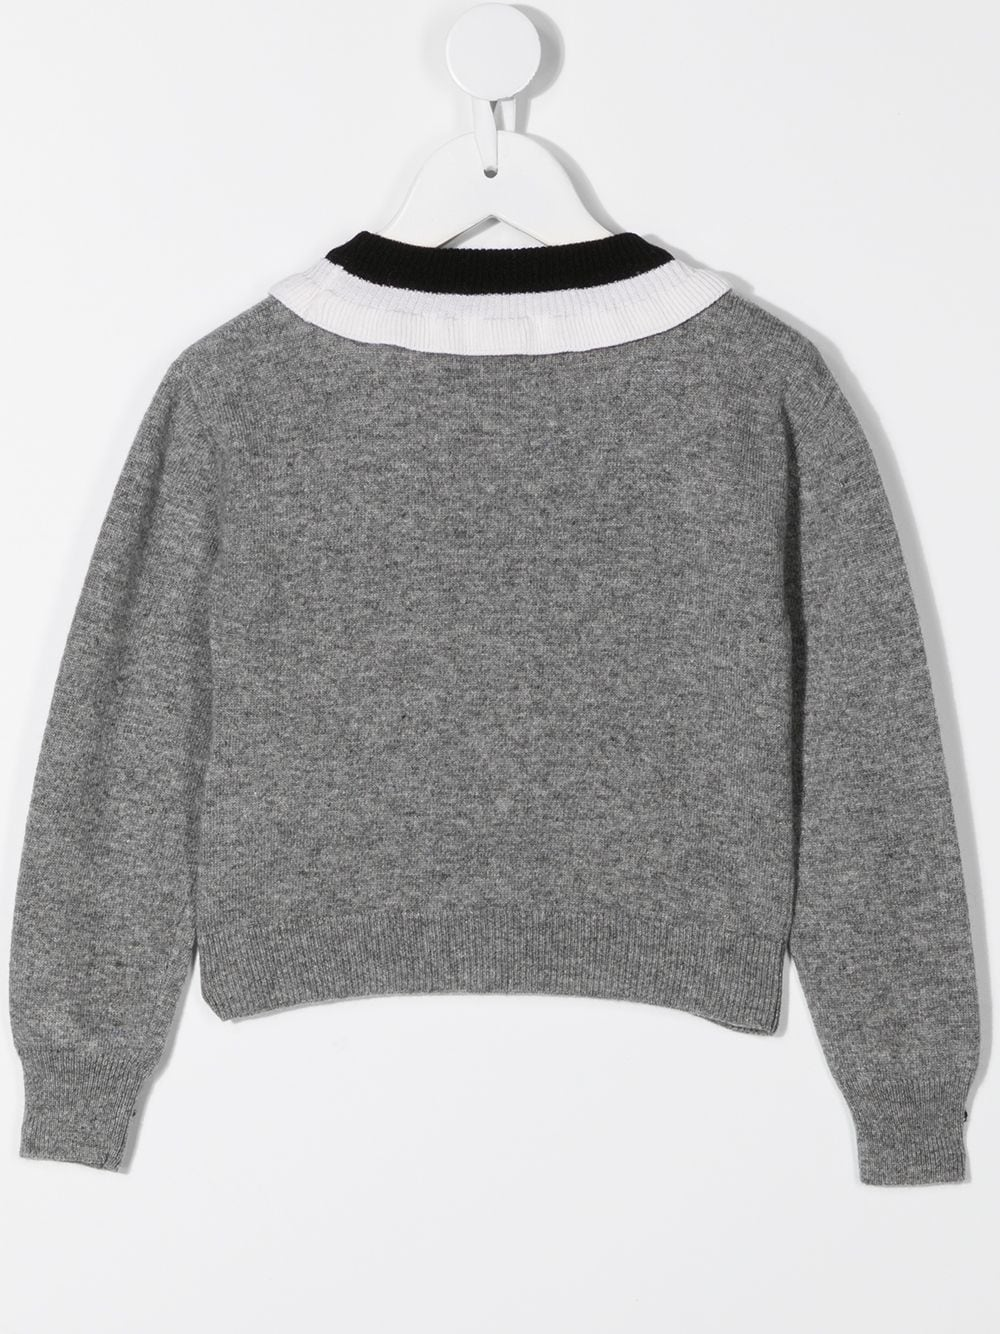 Sweater Simonetta SIMONETTA | 1 | 1N9510NF190910